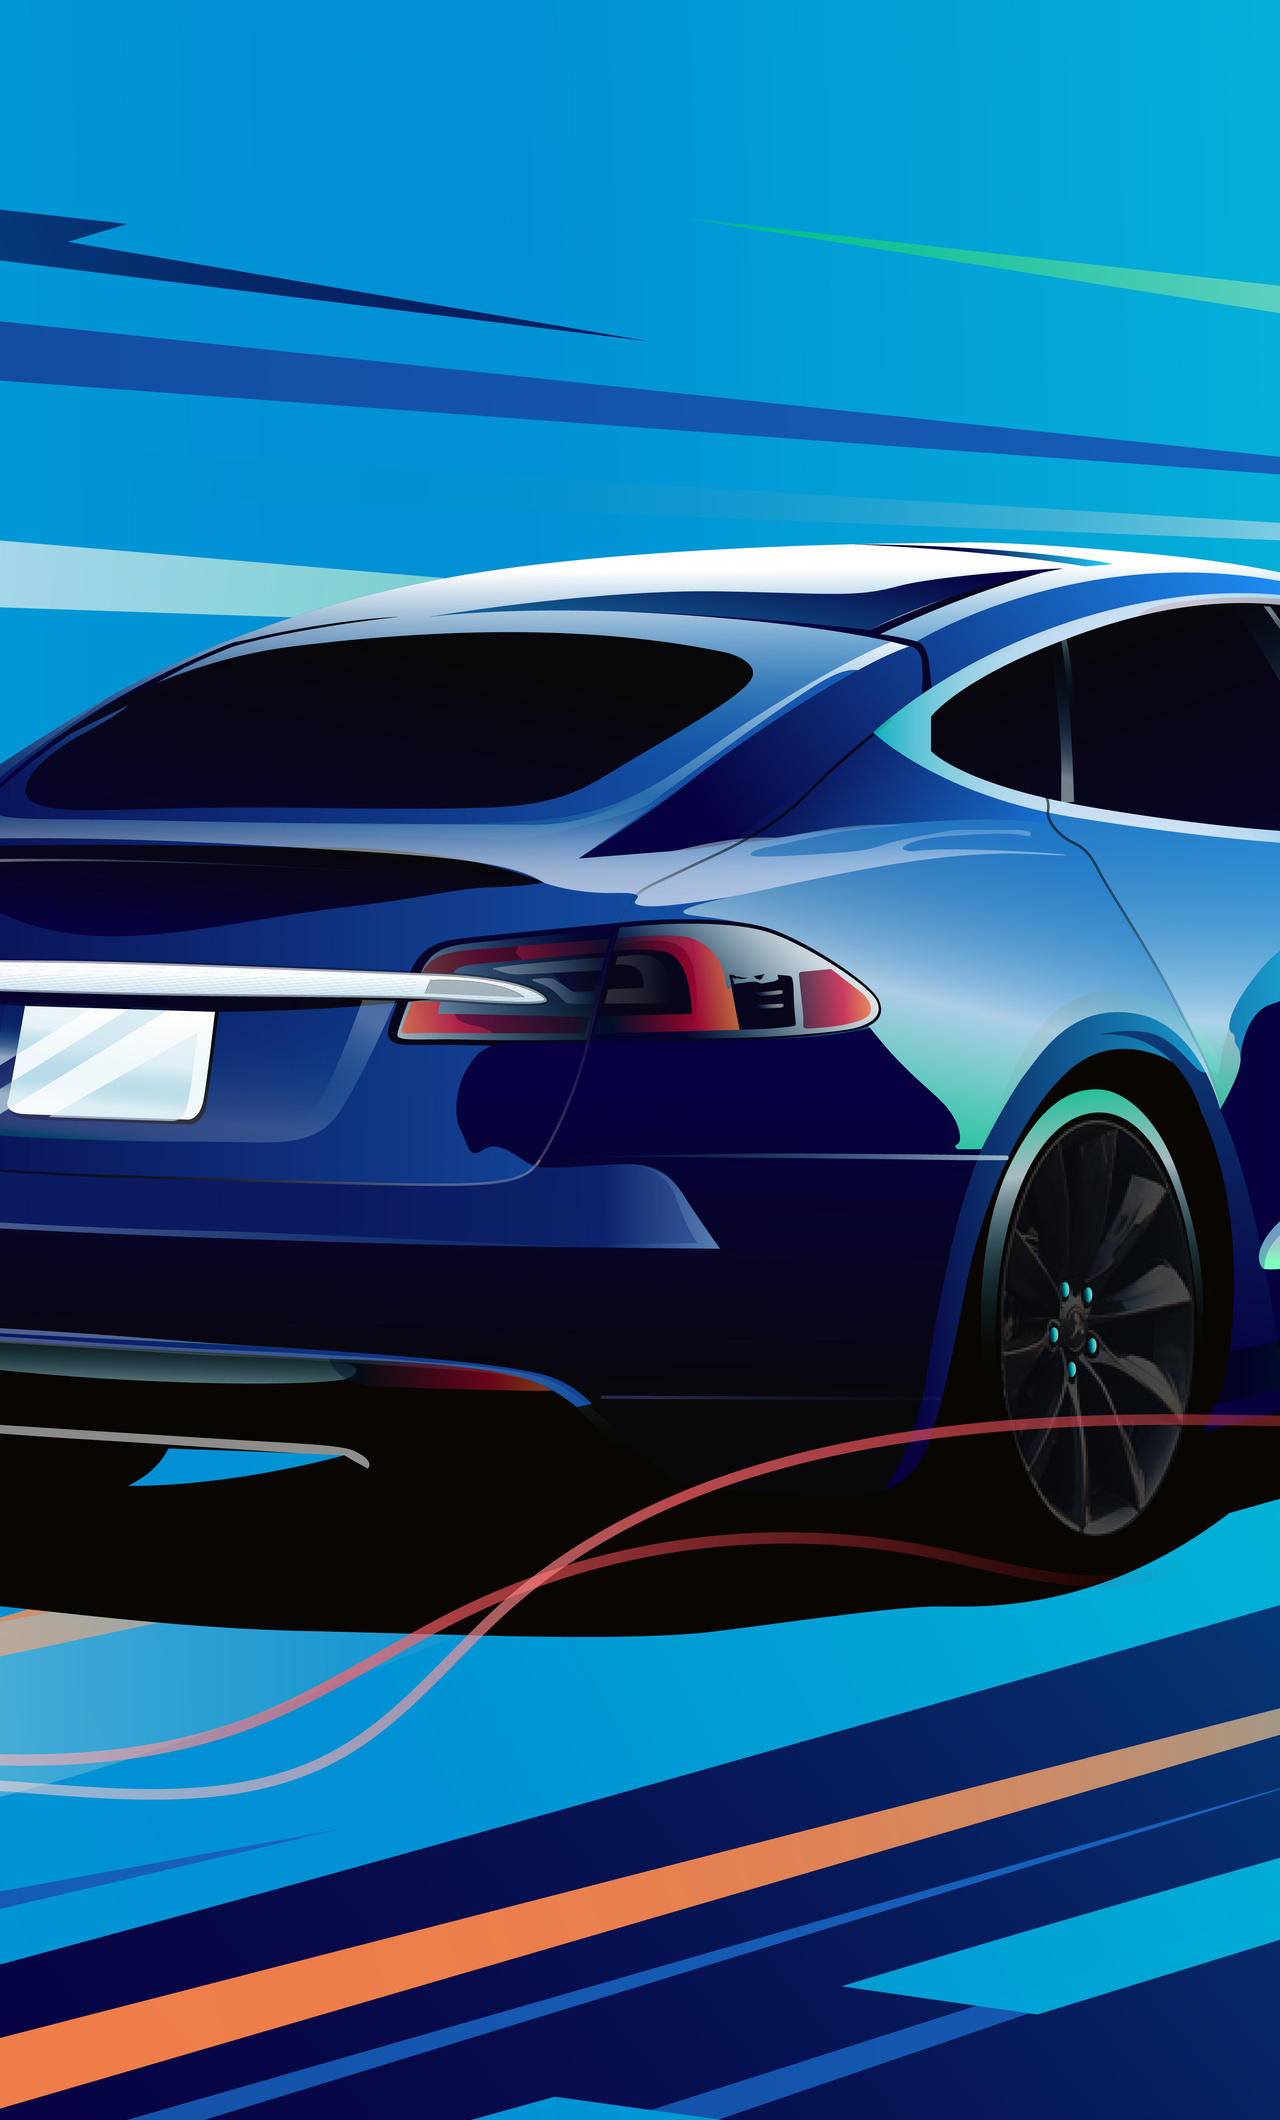 1280x2120 Tesla Model S Iphone 6 Hd 4k Wallpapers Images